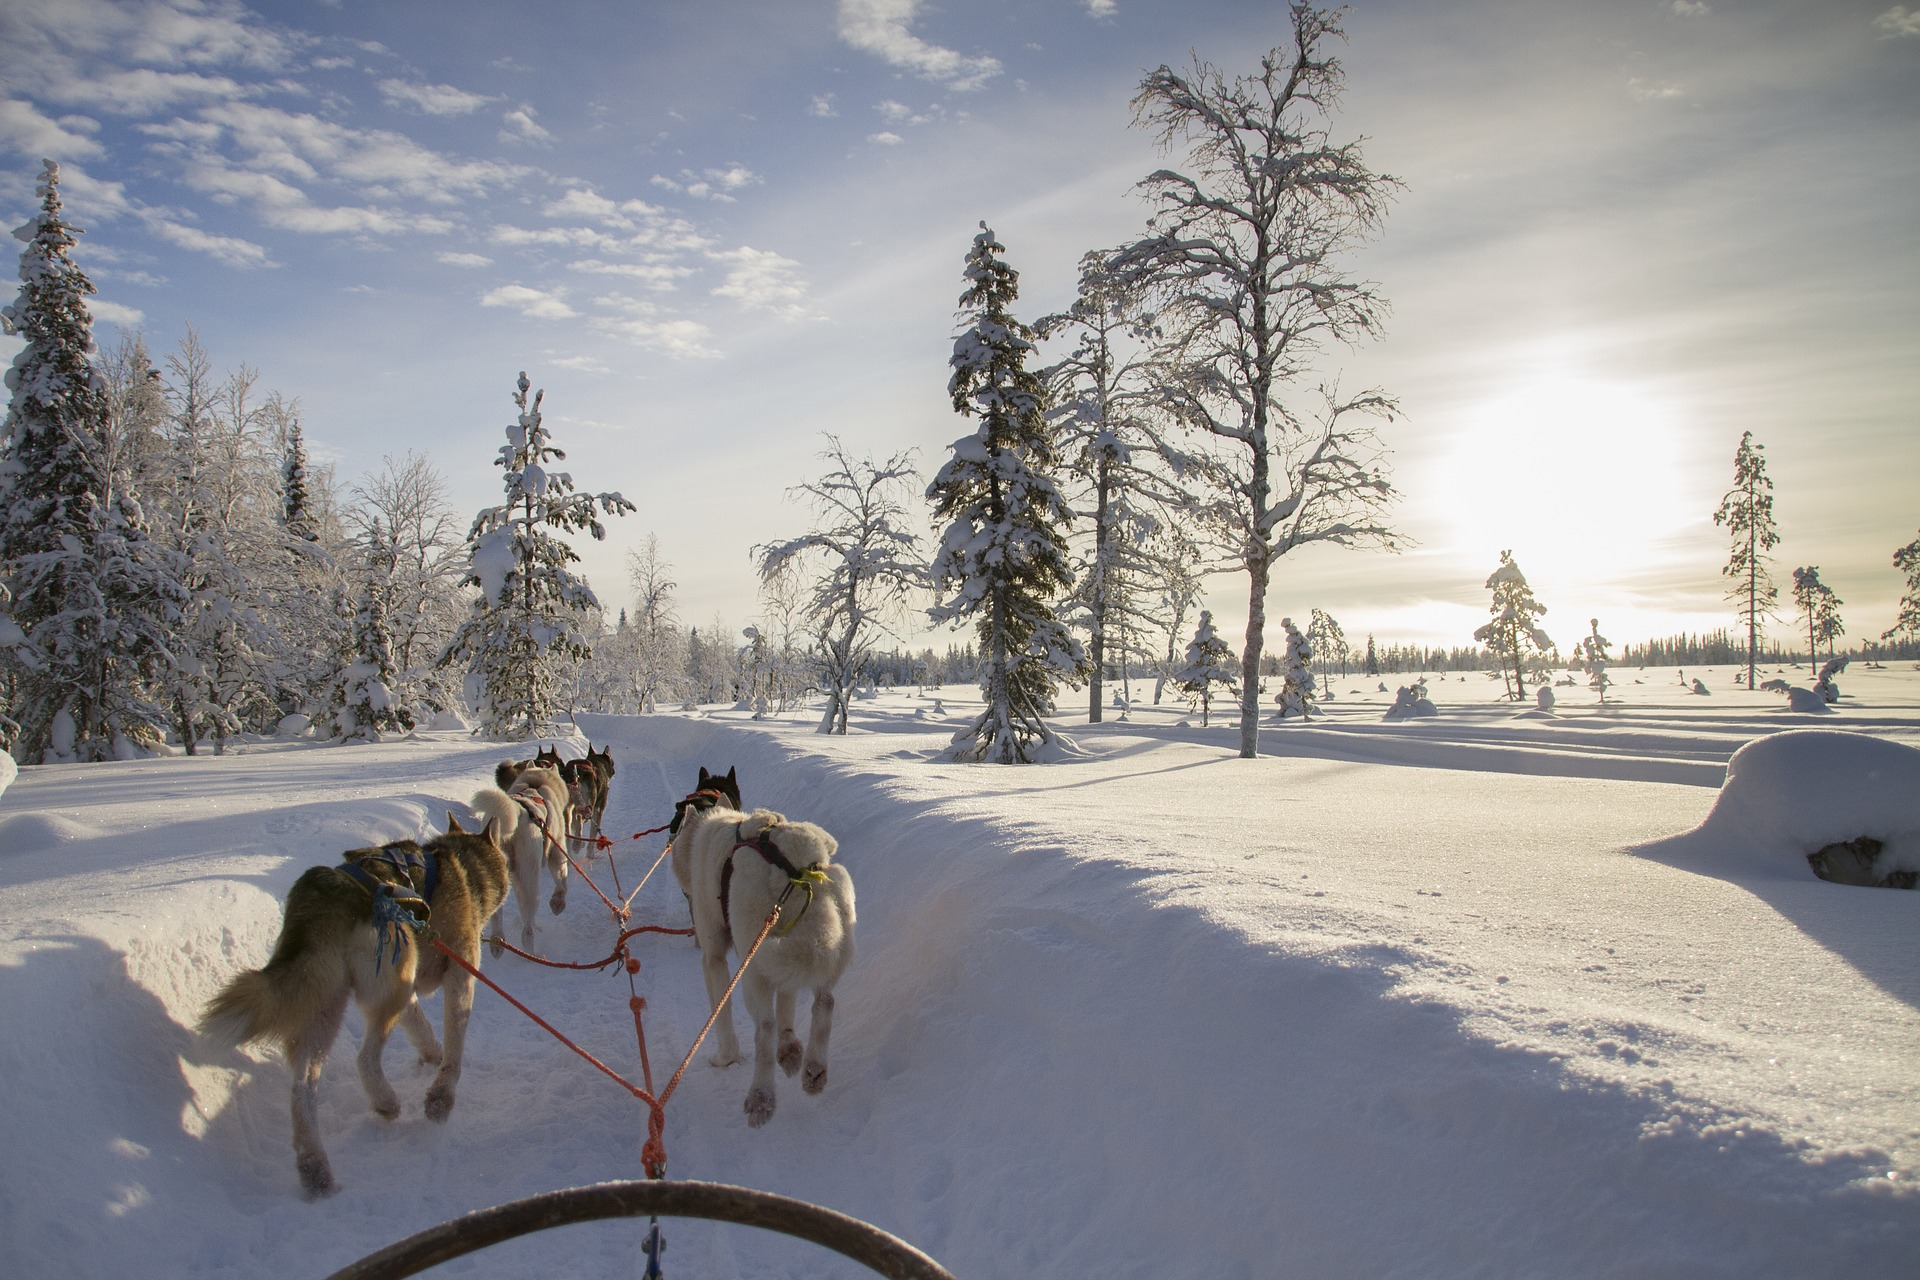 finland-2215323_1920.jpg